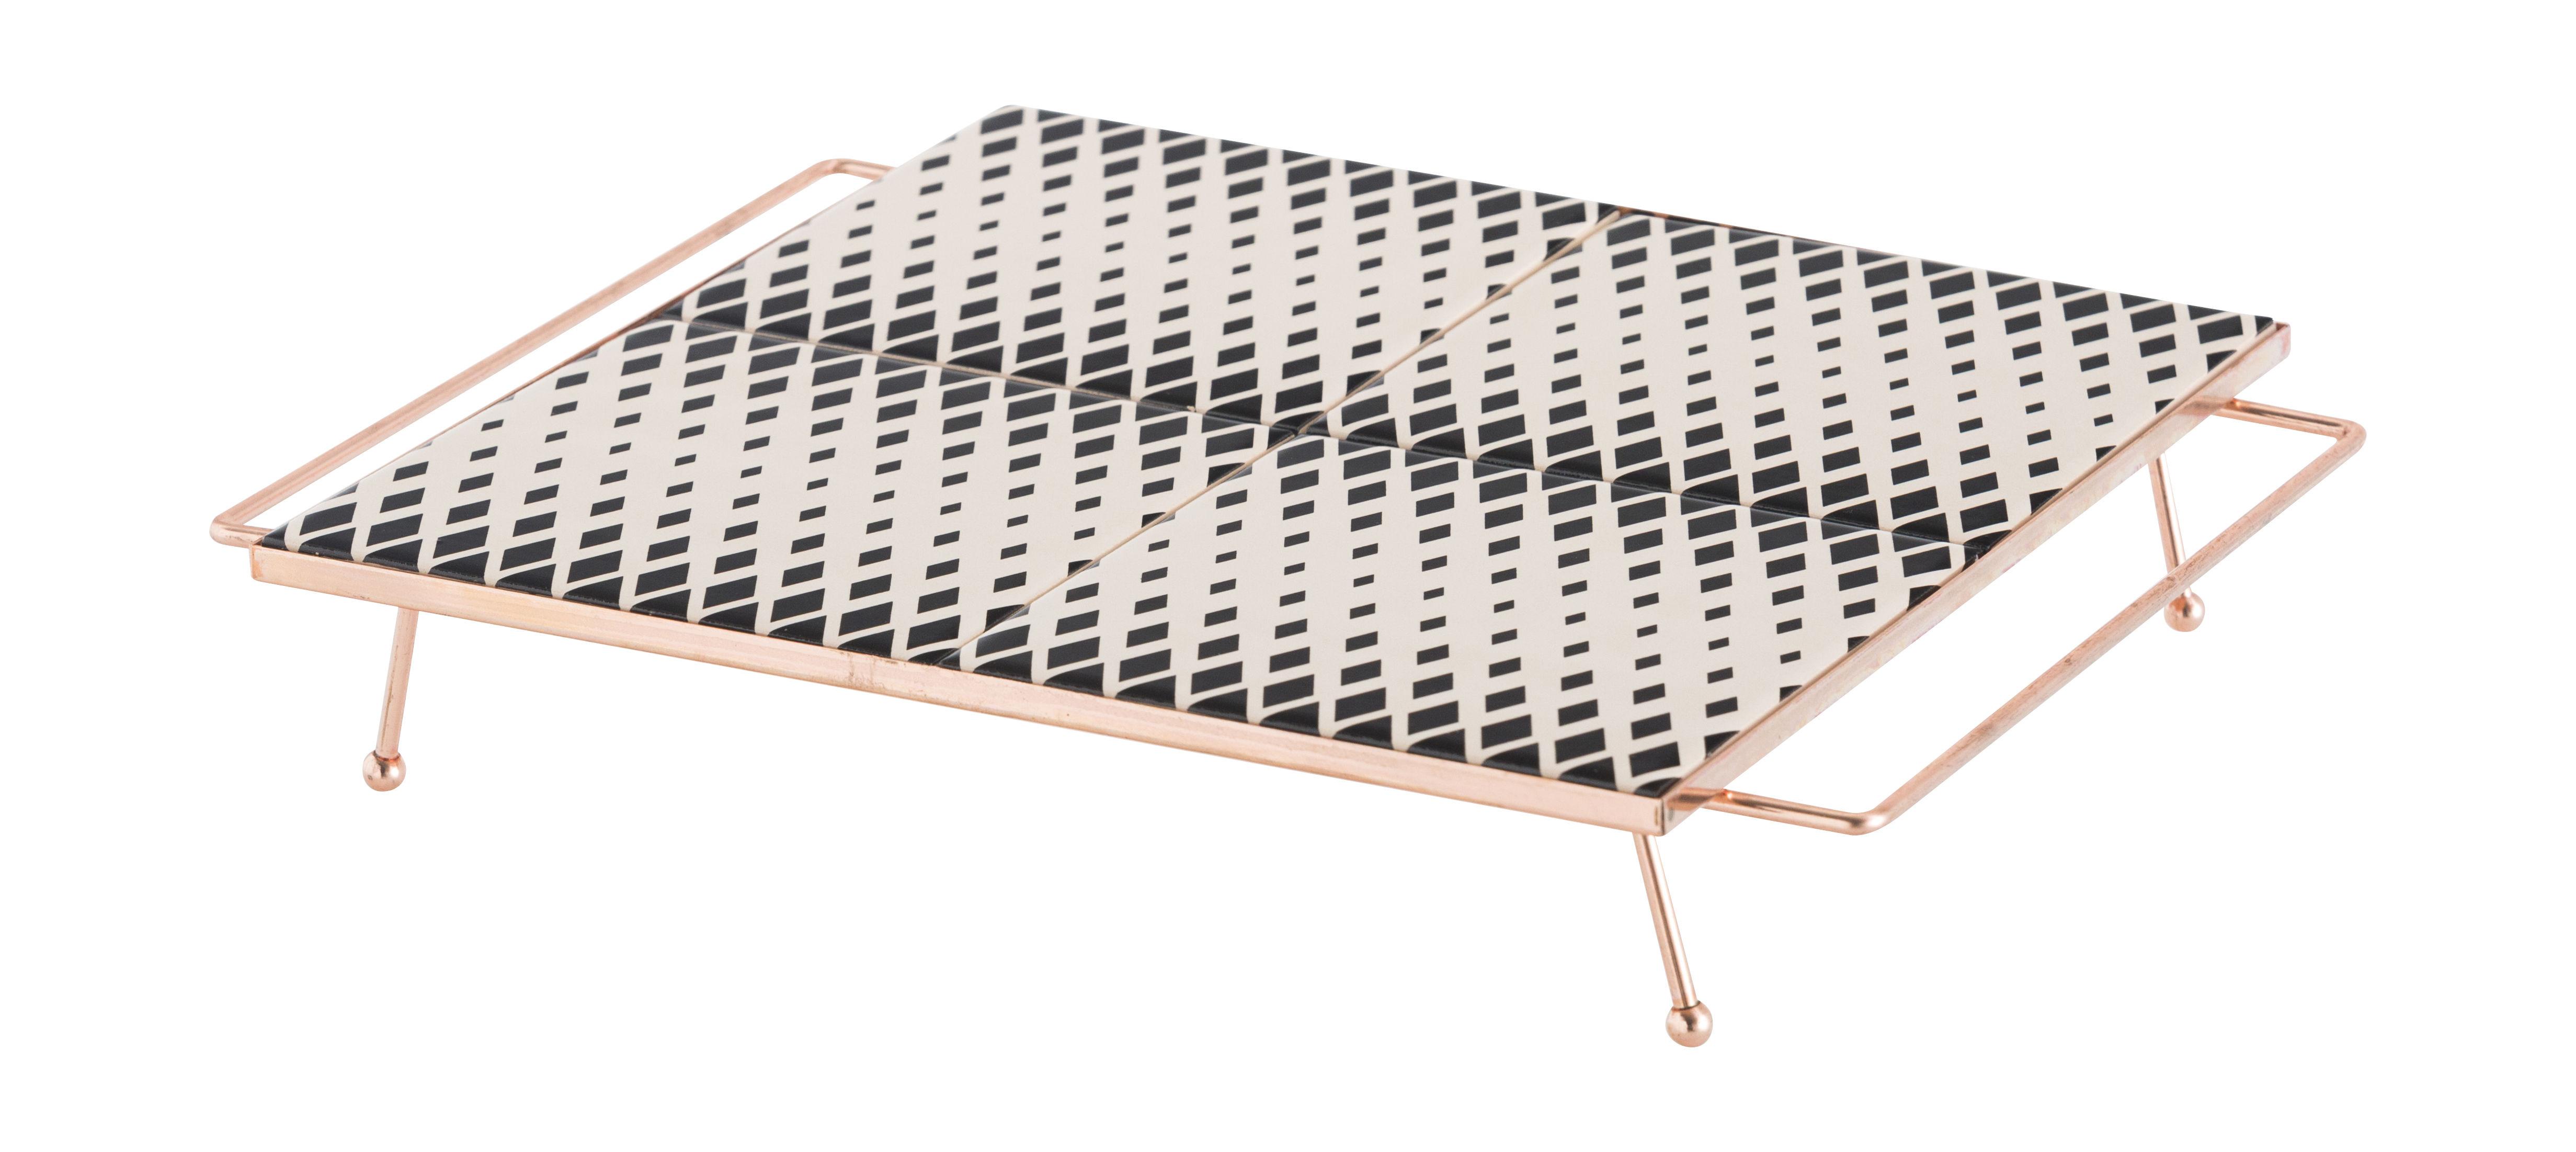 Tableware - Trays - Mix&Match Tray - 30 x 30 cm / Ceramic & copper by Gan - Black & white - Ceramic, Copper plated aluminium